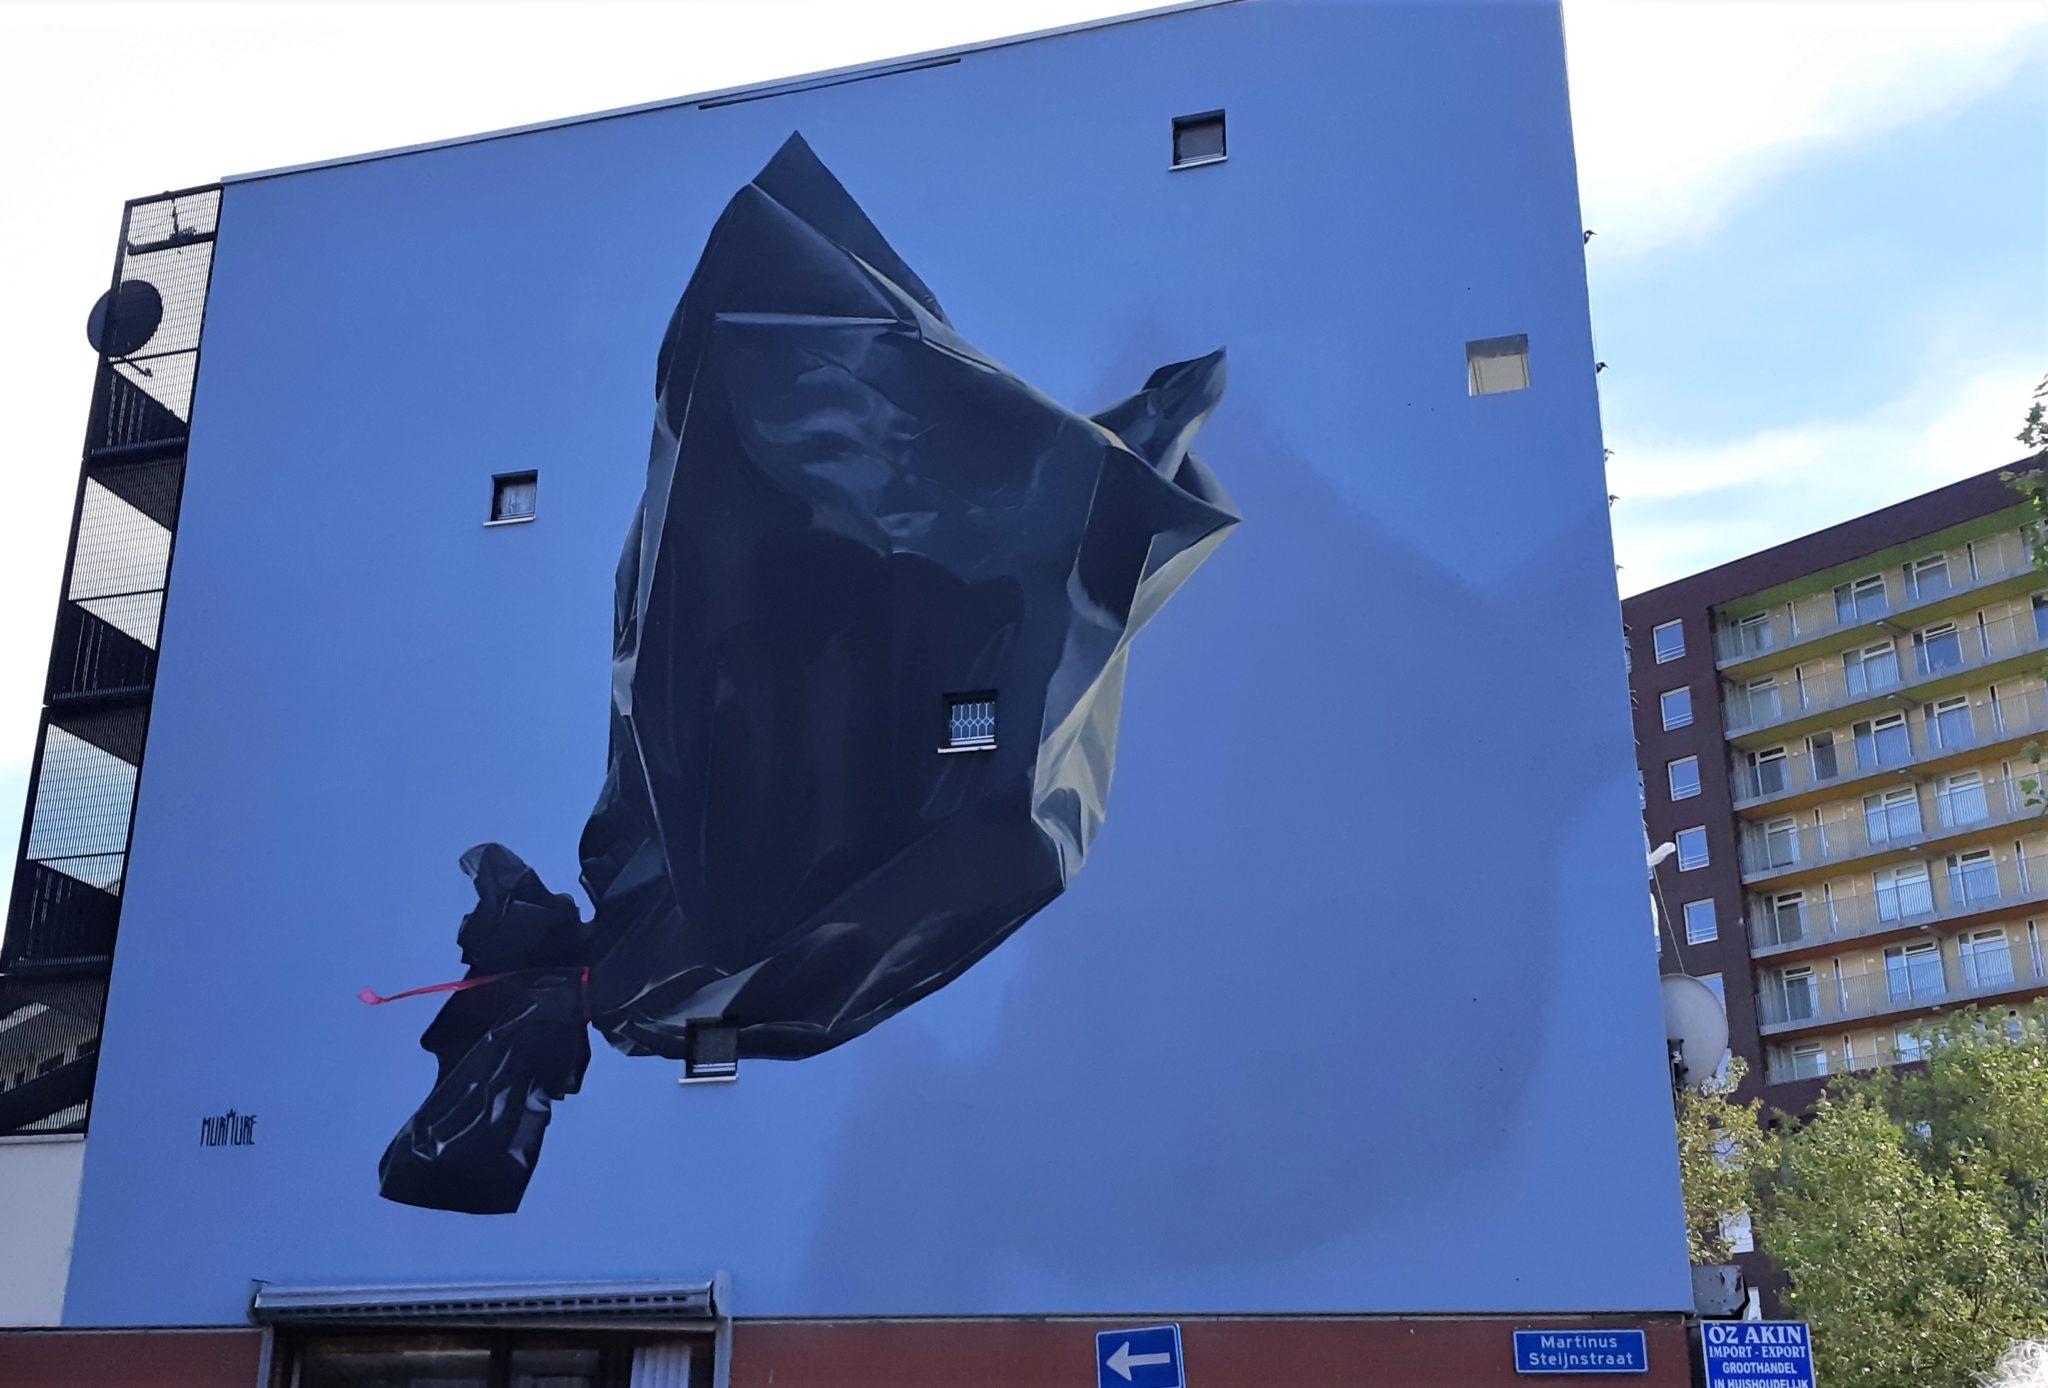 pow wow street art rotterdam